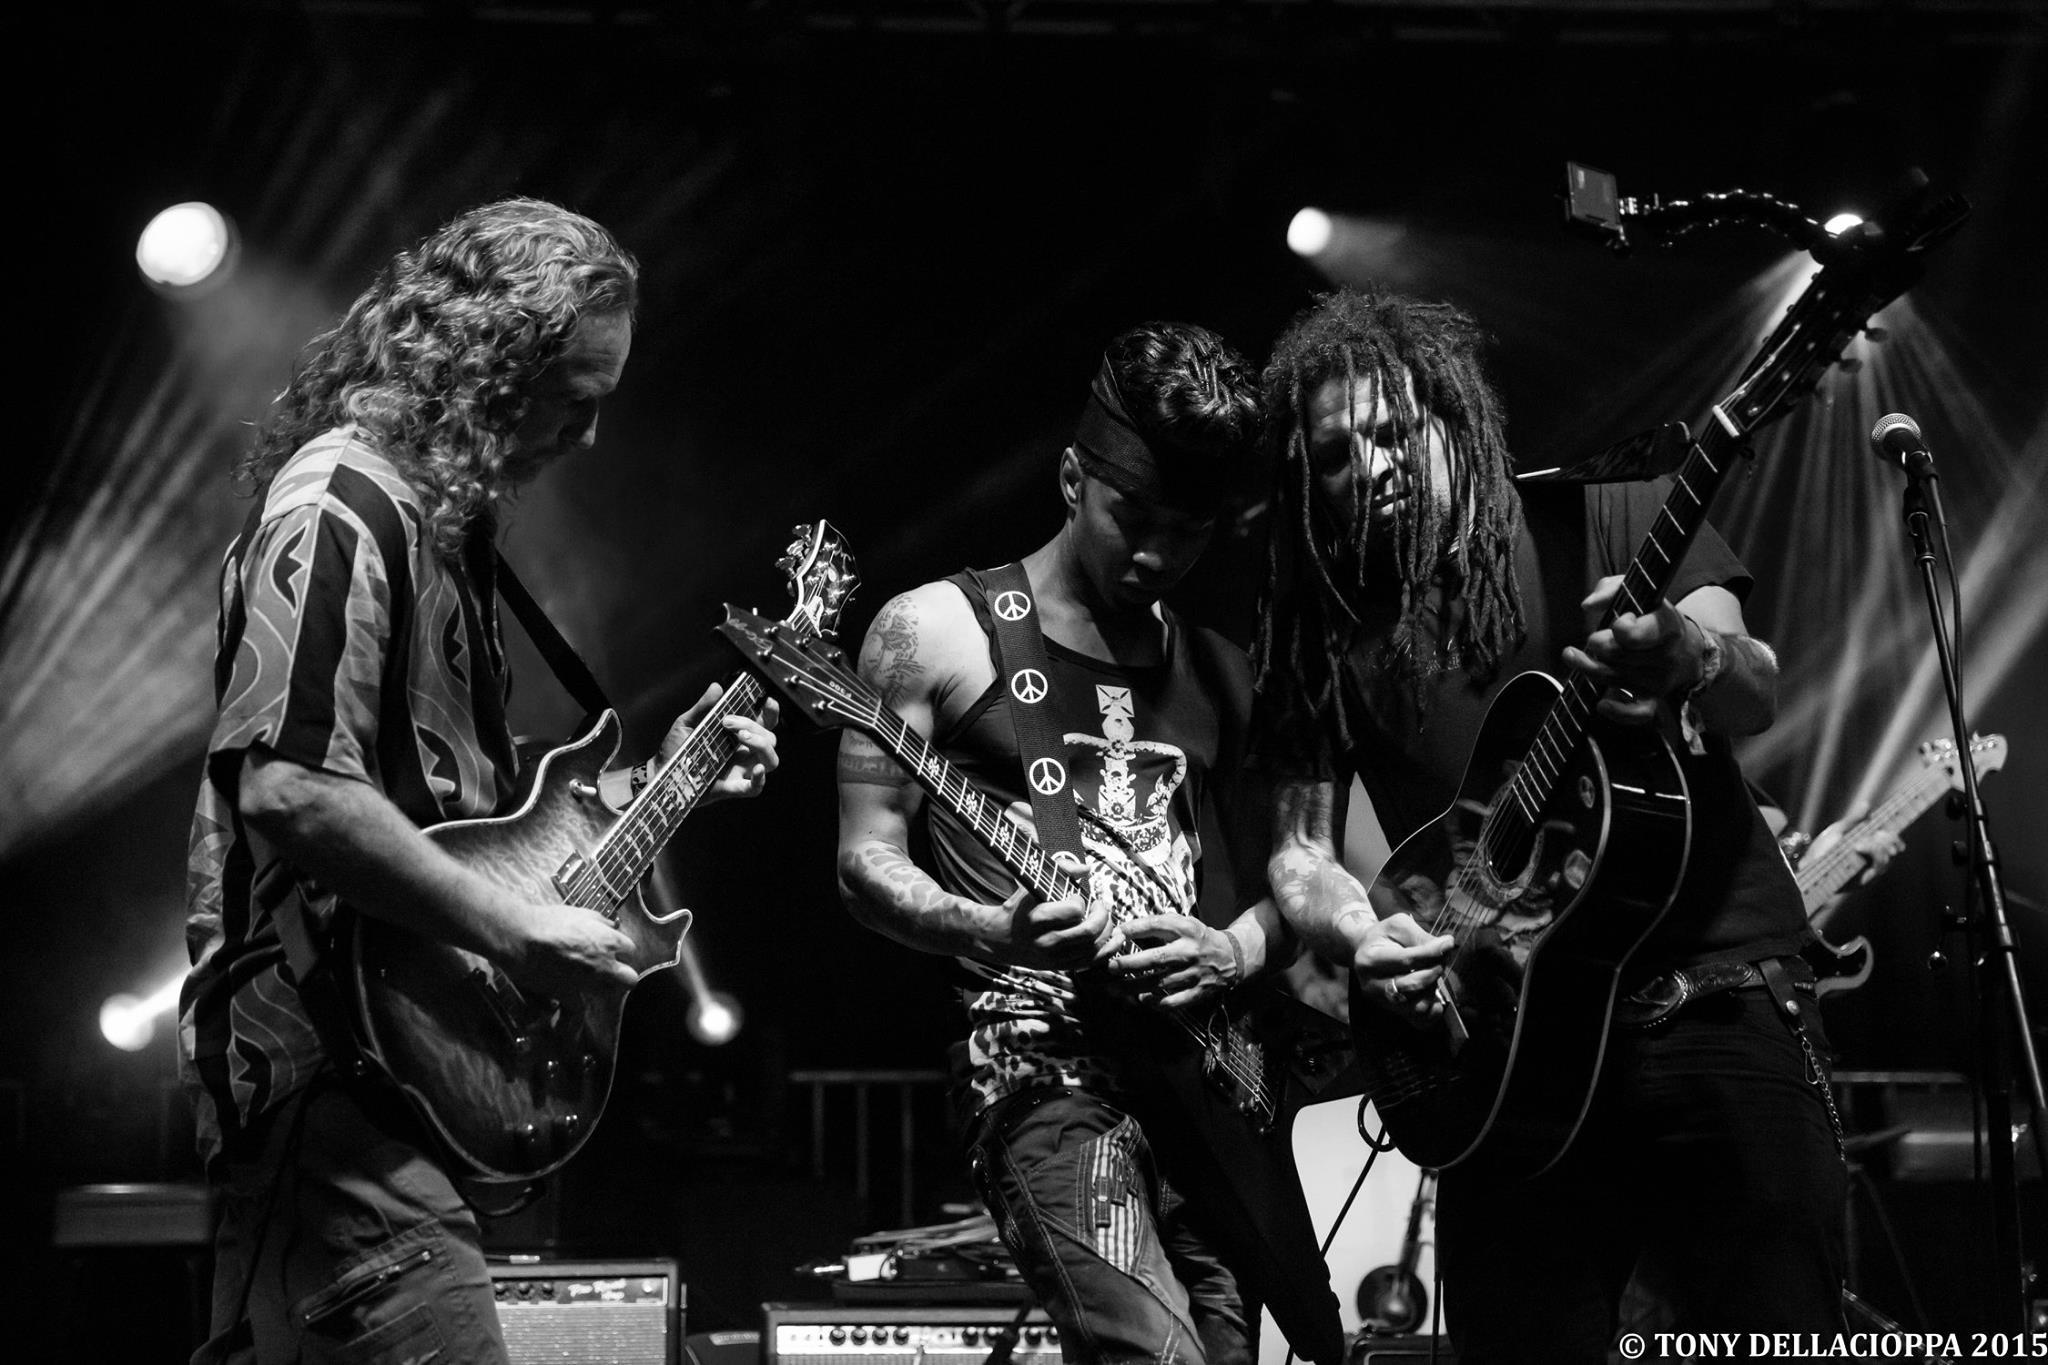 Guitarmaggedon @ High Sierra Music Fest 2015